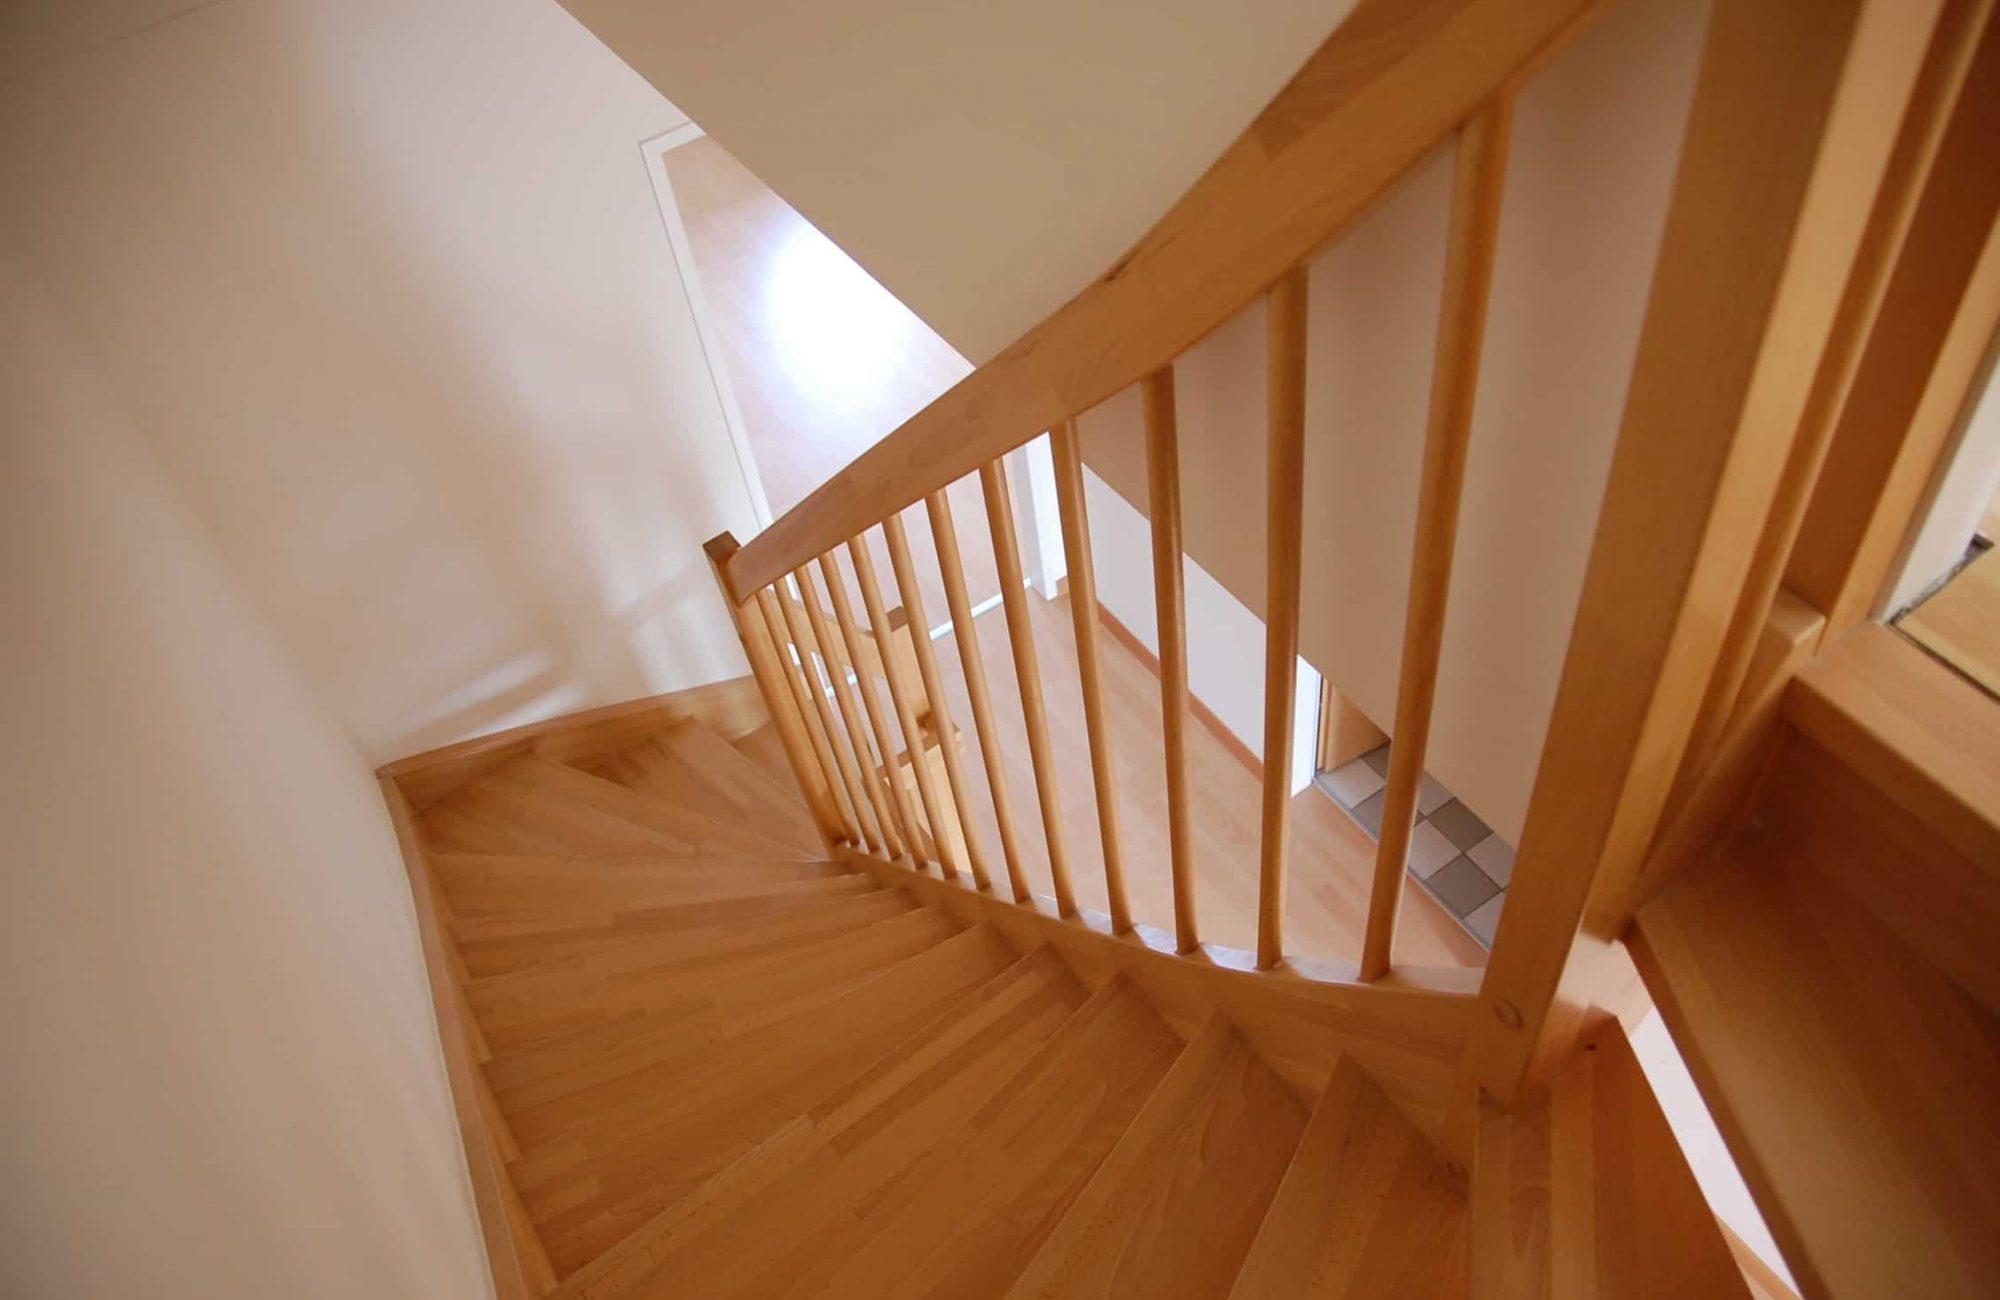 Brown Wooden Handrail